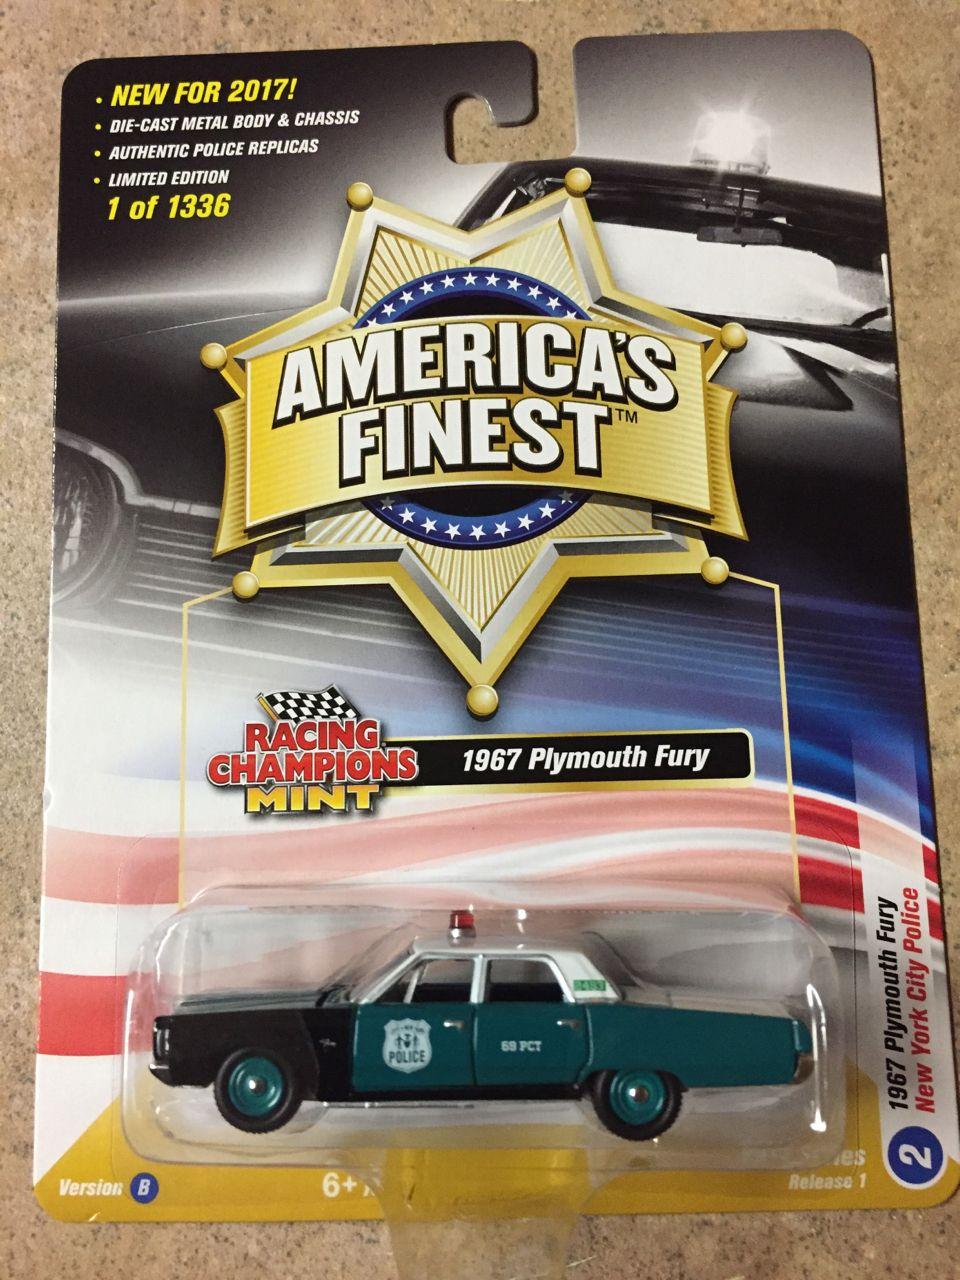 B toys car wheel  Version B  Plymouth Fury  Diecast  Pinterest  Plymouth fury